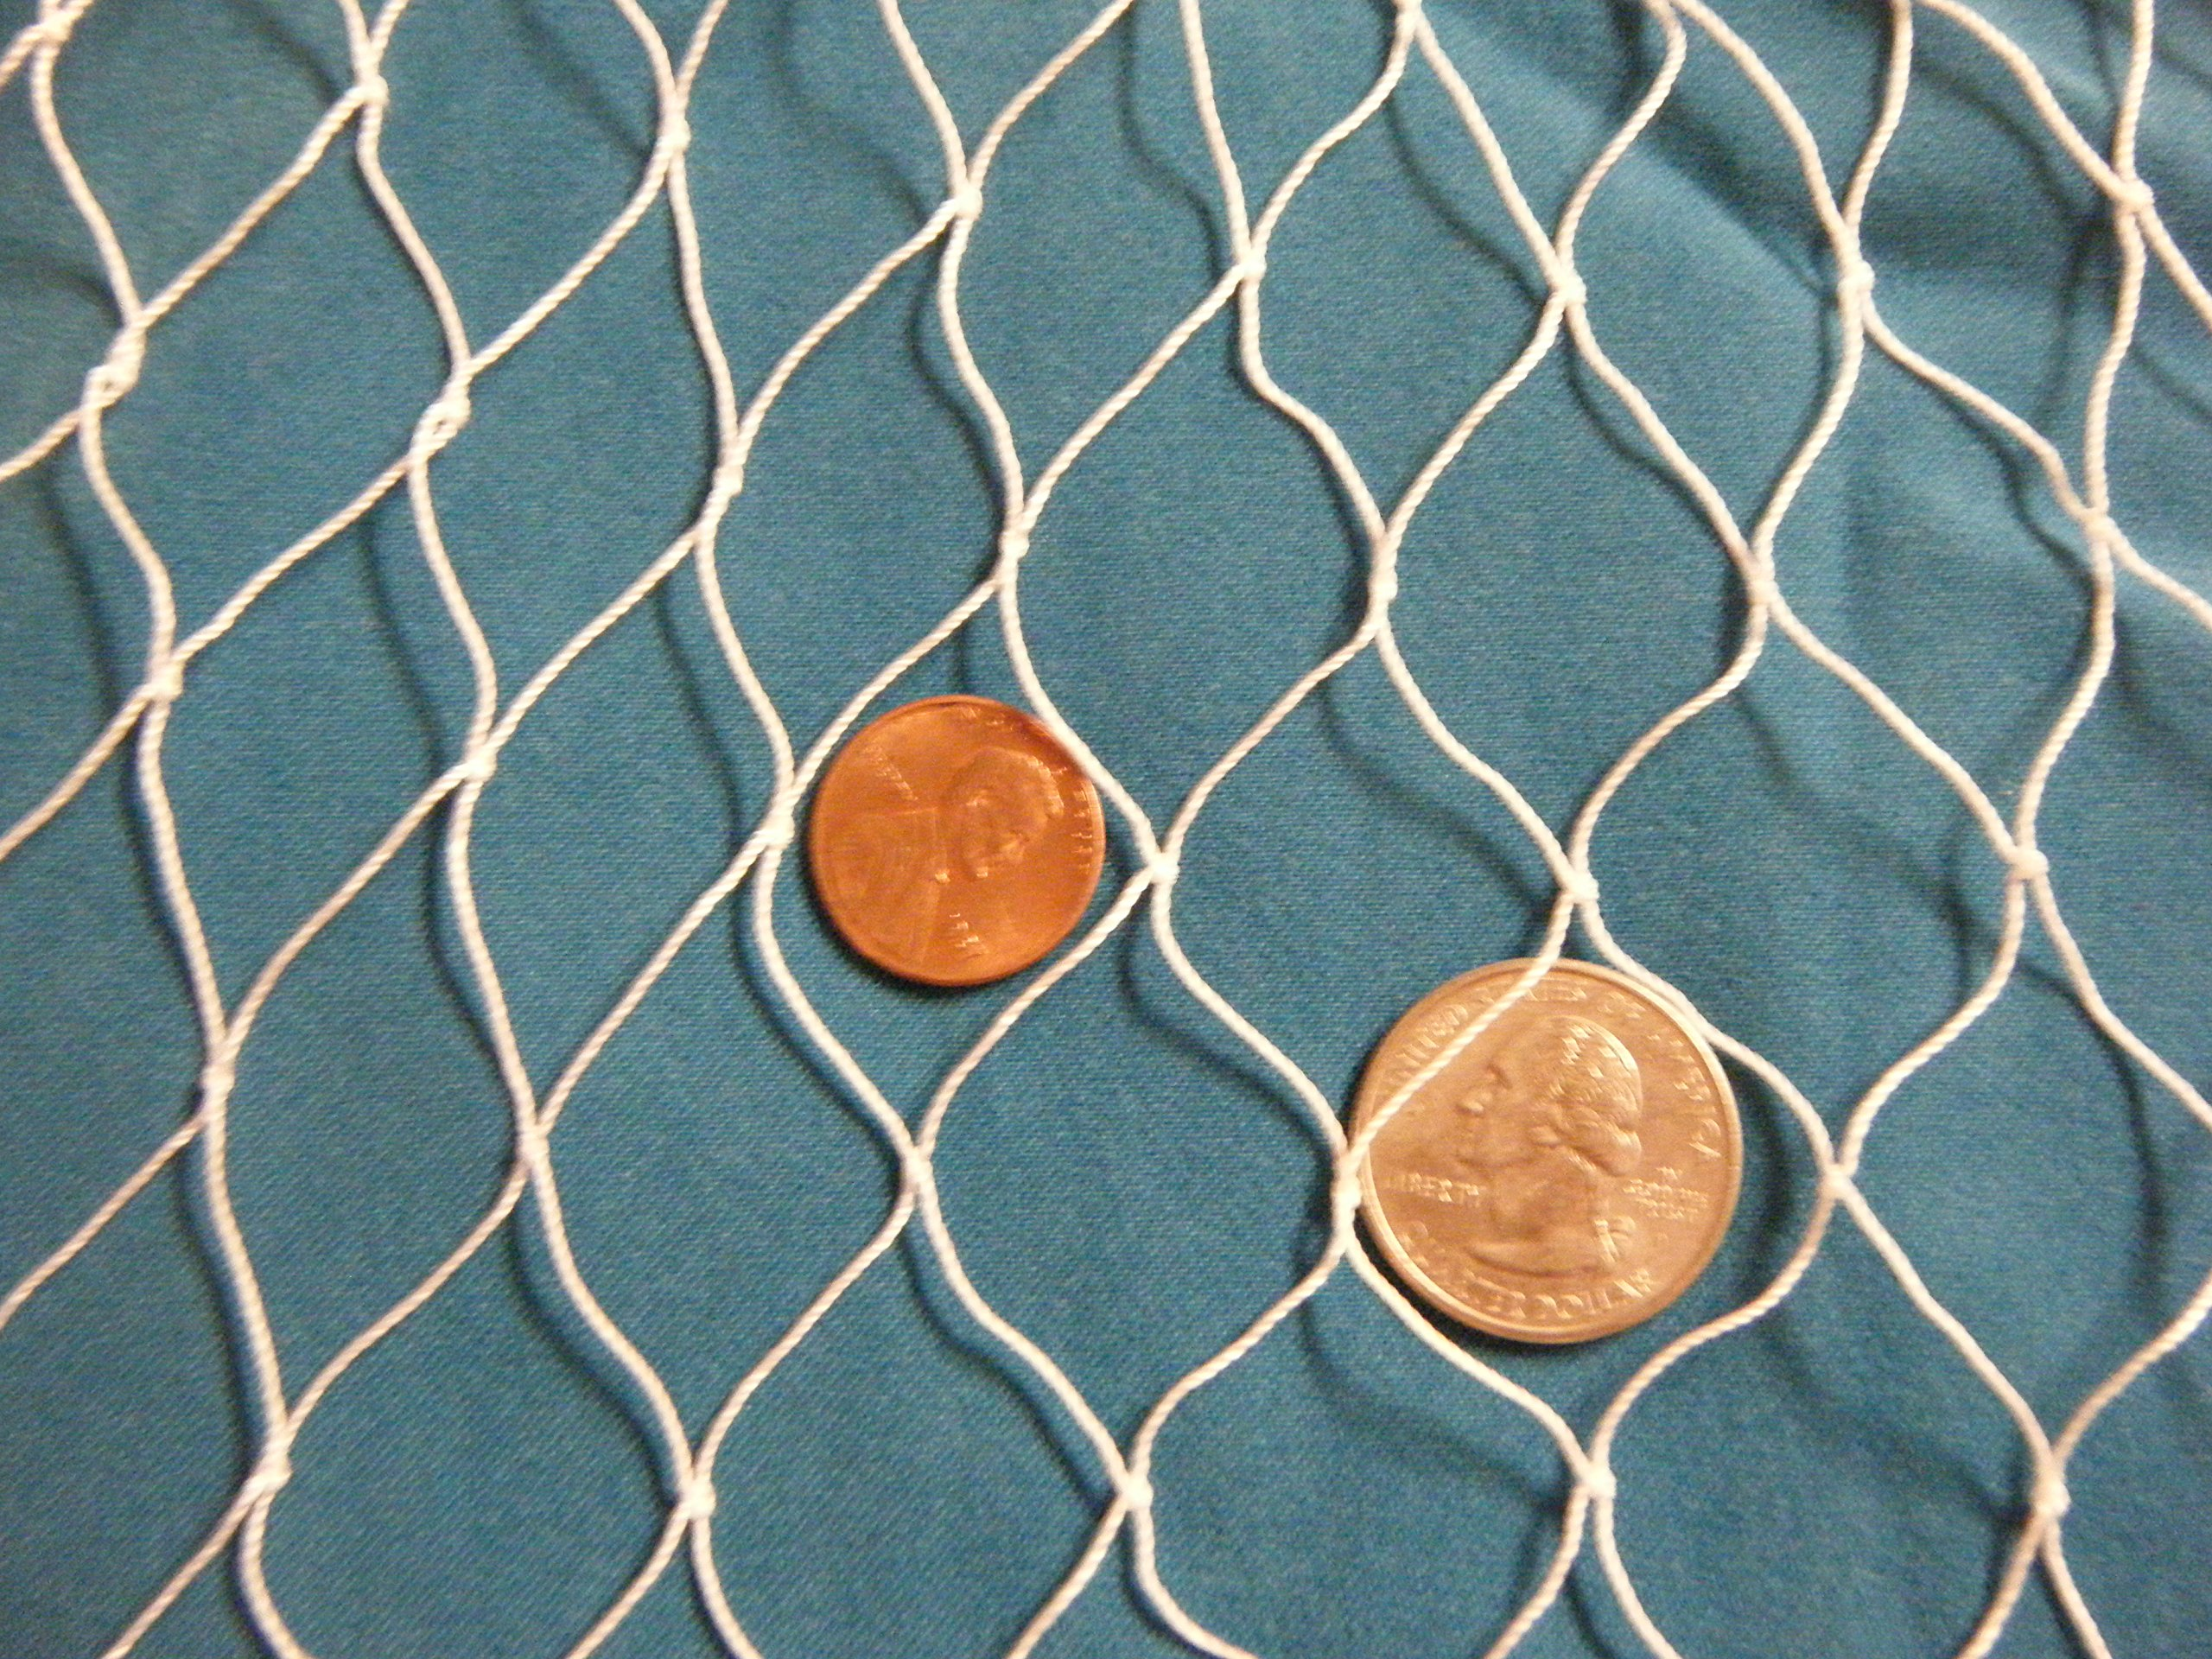 10 X 12 Ft New Fishing Net, Bird Netting, Turkey, Hawks, Predaters, Chicken Coops, COYOTE by Florida Nets (Image #3)